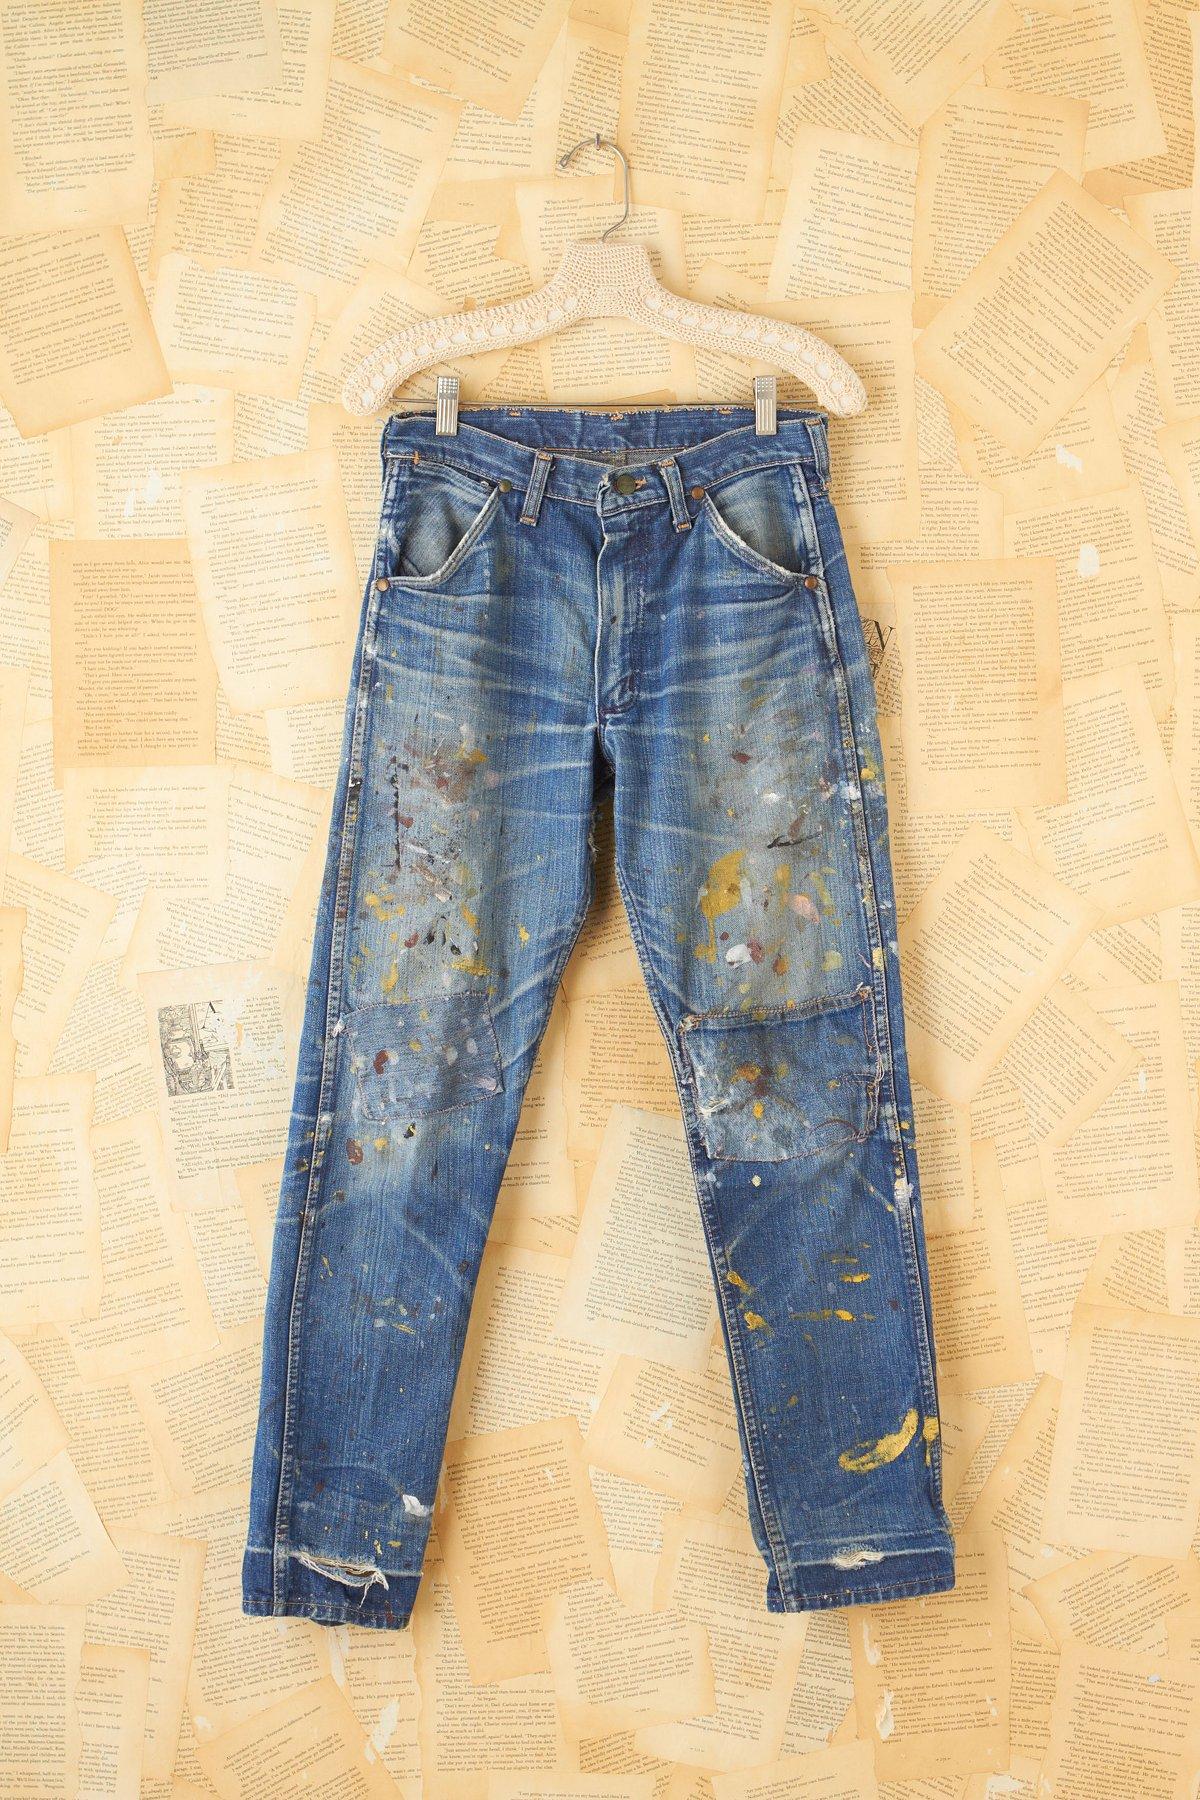 Vintage Paint Splattered Distressed Jeans